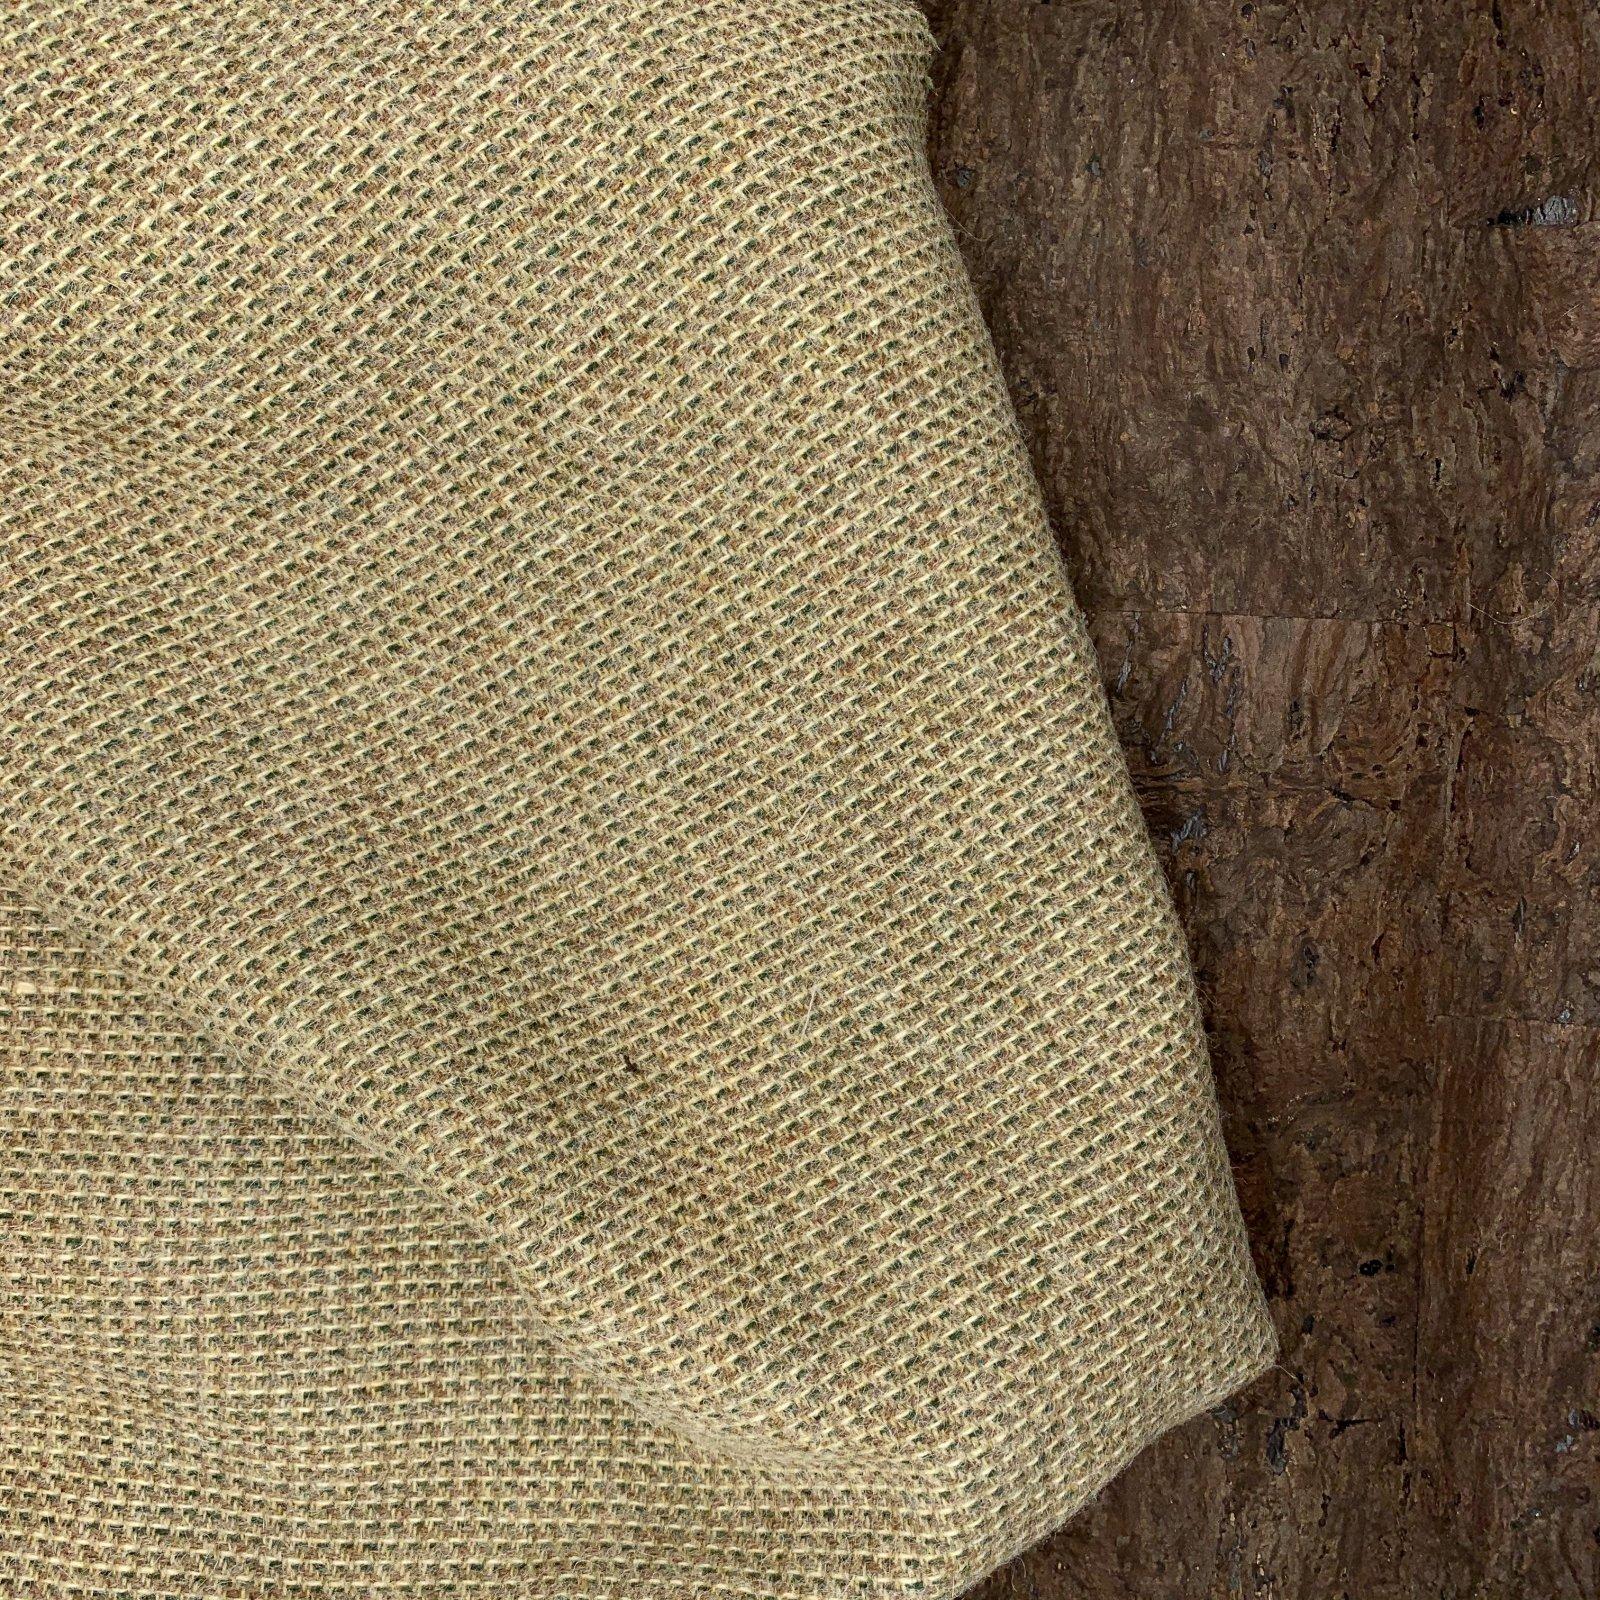 Designer Wool Coating - Green & Beige Weave